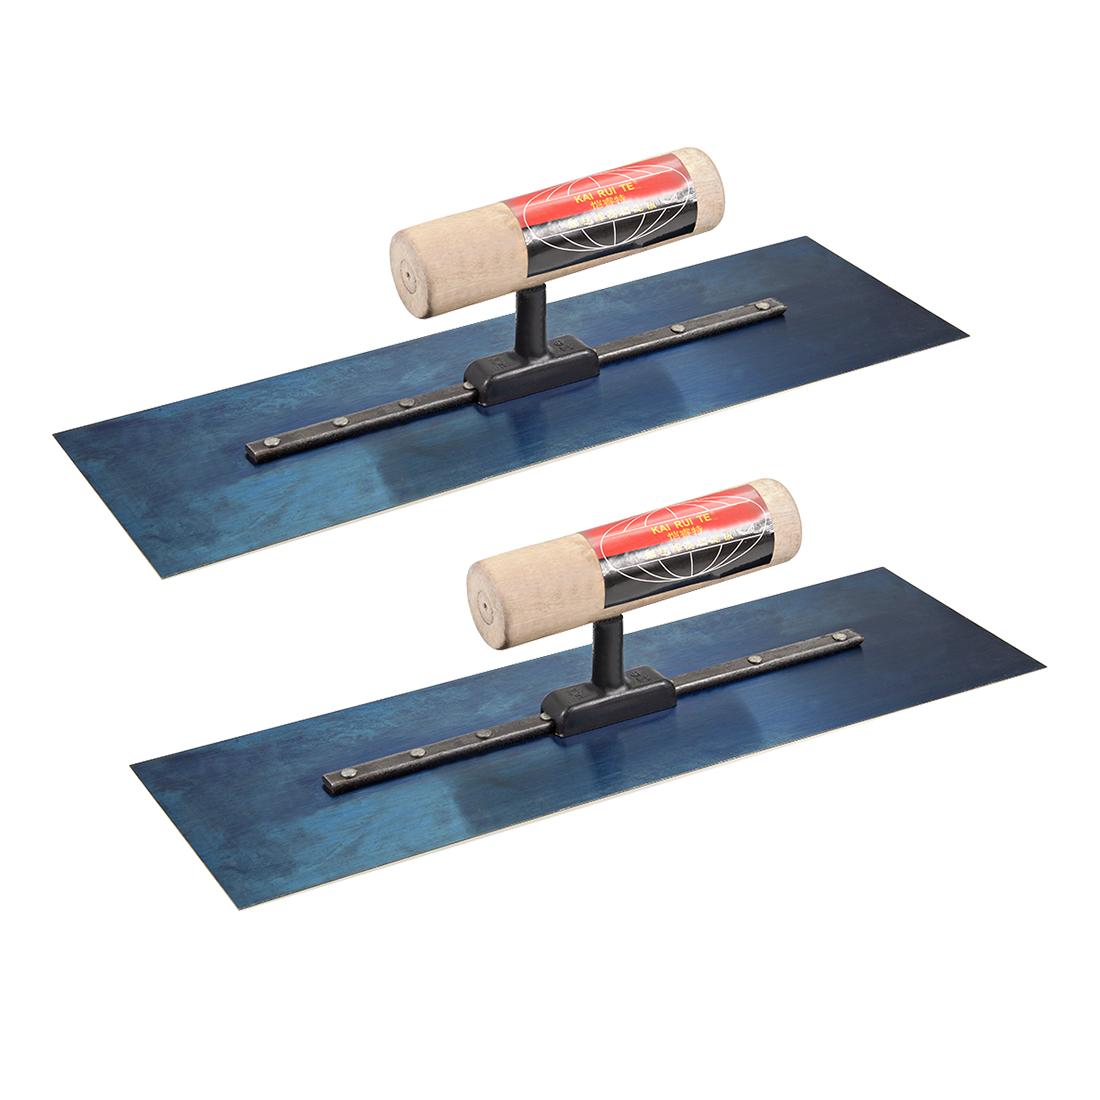 Masonry Hand Trowel Drywall Concrete Finishing Tool 12x4 Steel Wood Handle 2pcs